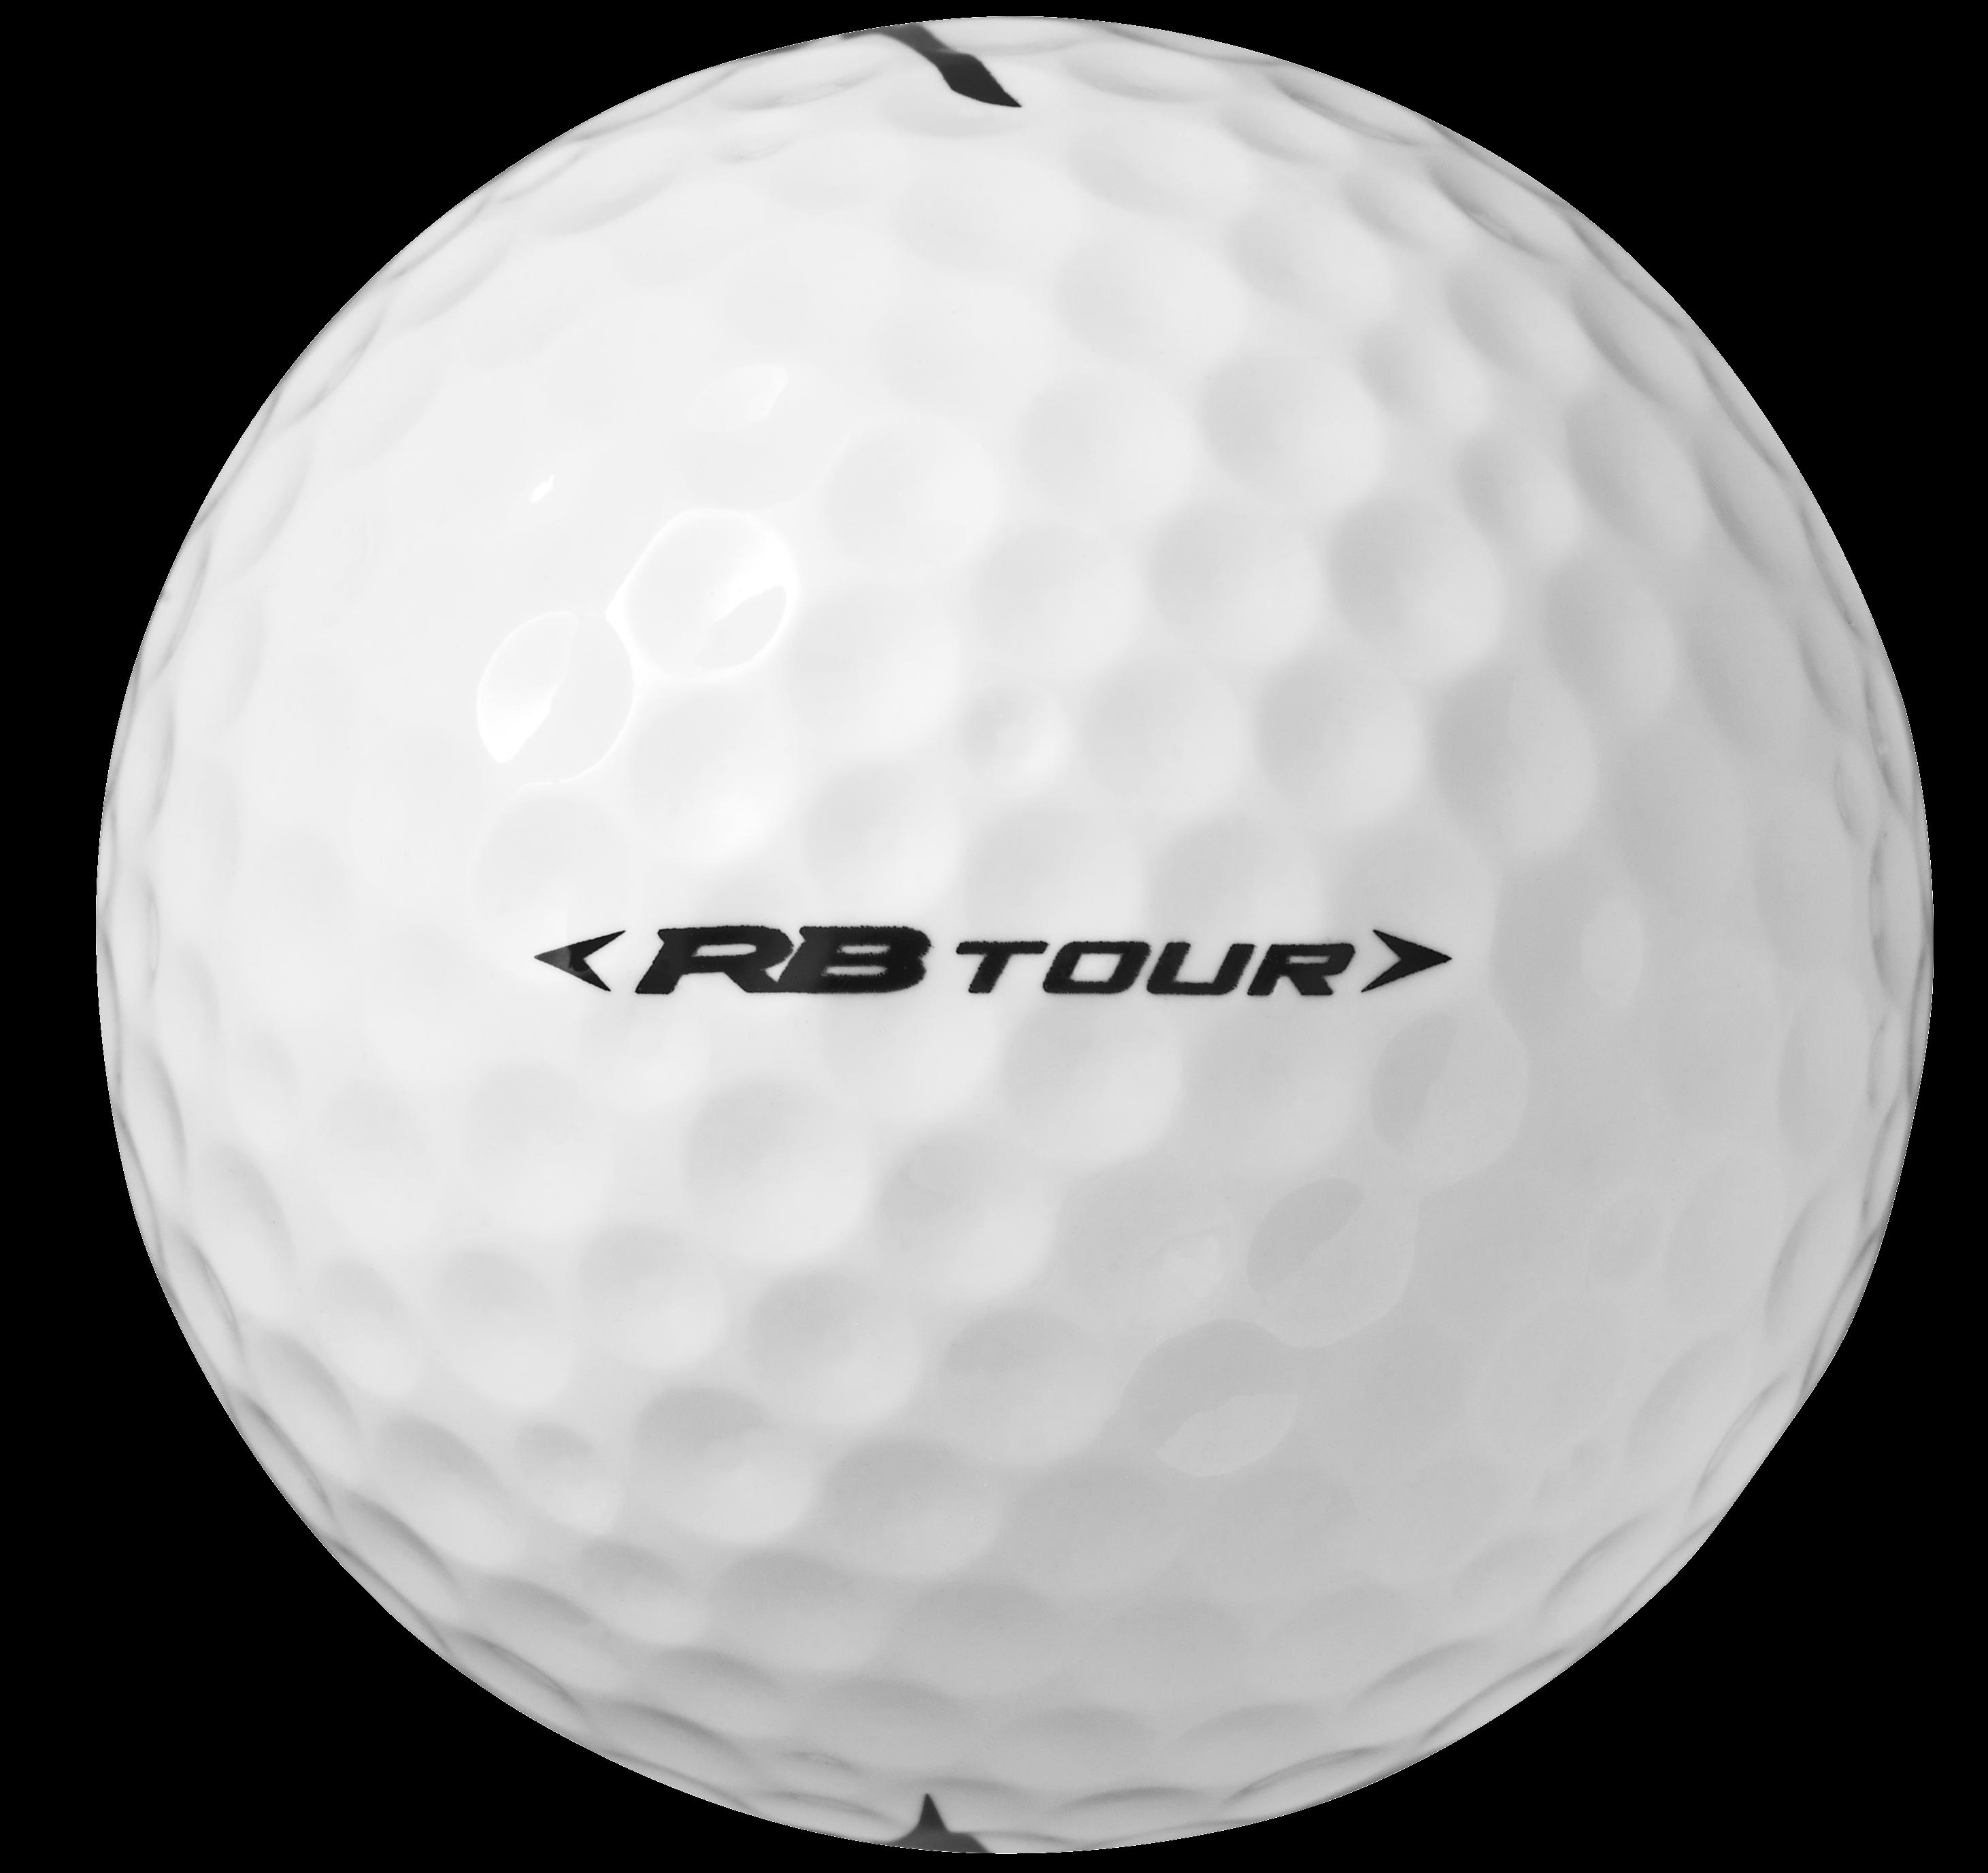 3633d22a33c Mizuno RB Tour 1 Dozen Golf Balls - White - Mens For Sale